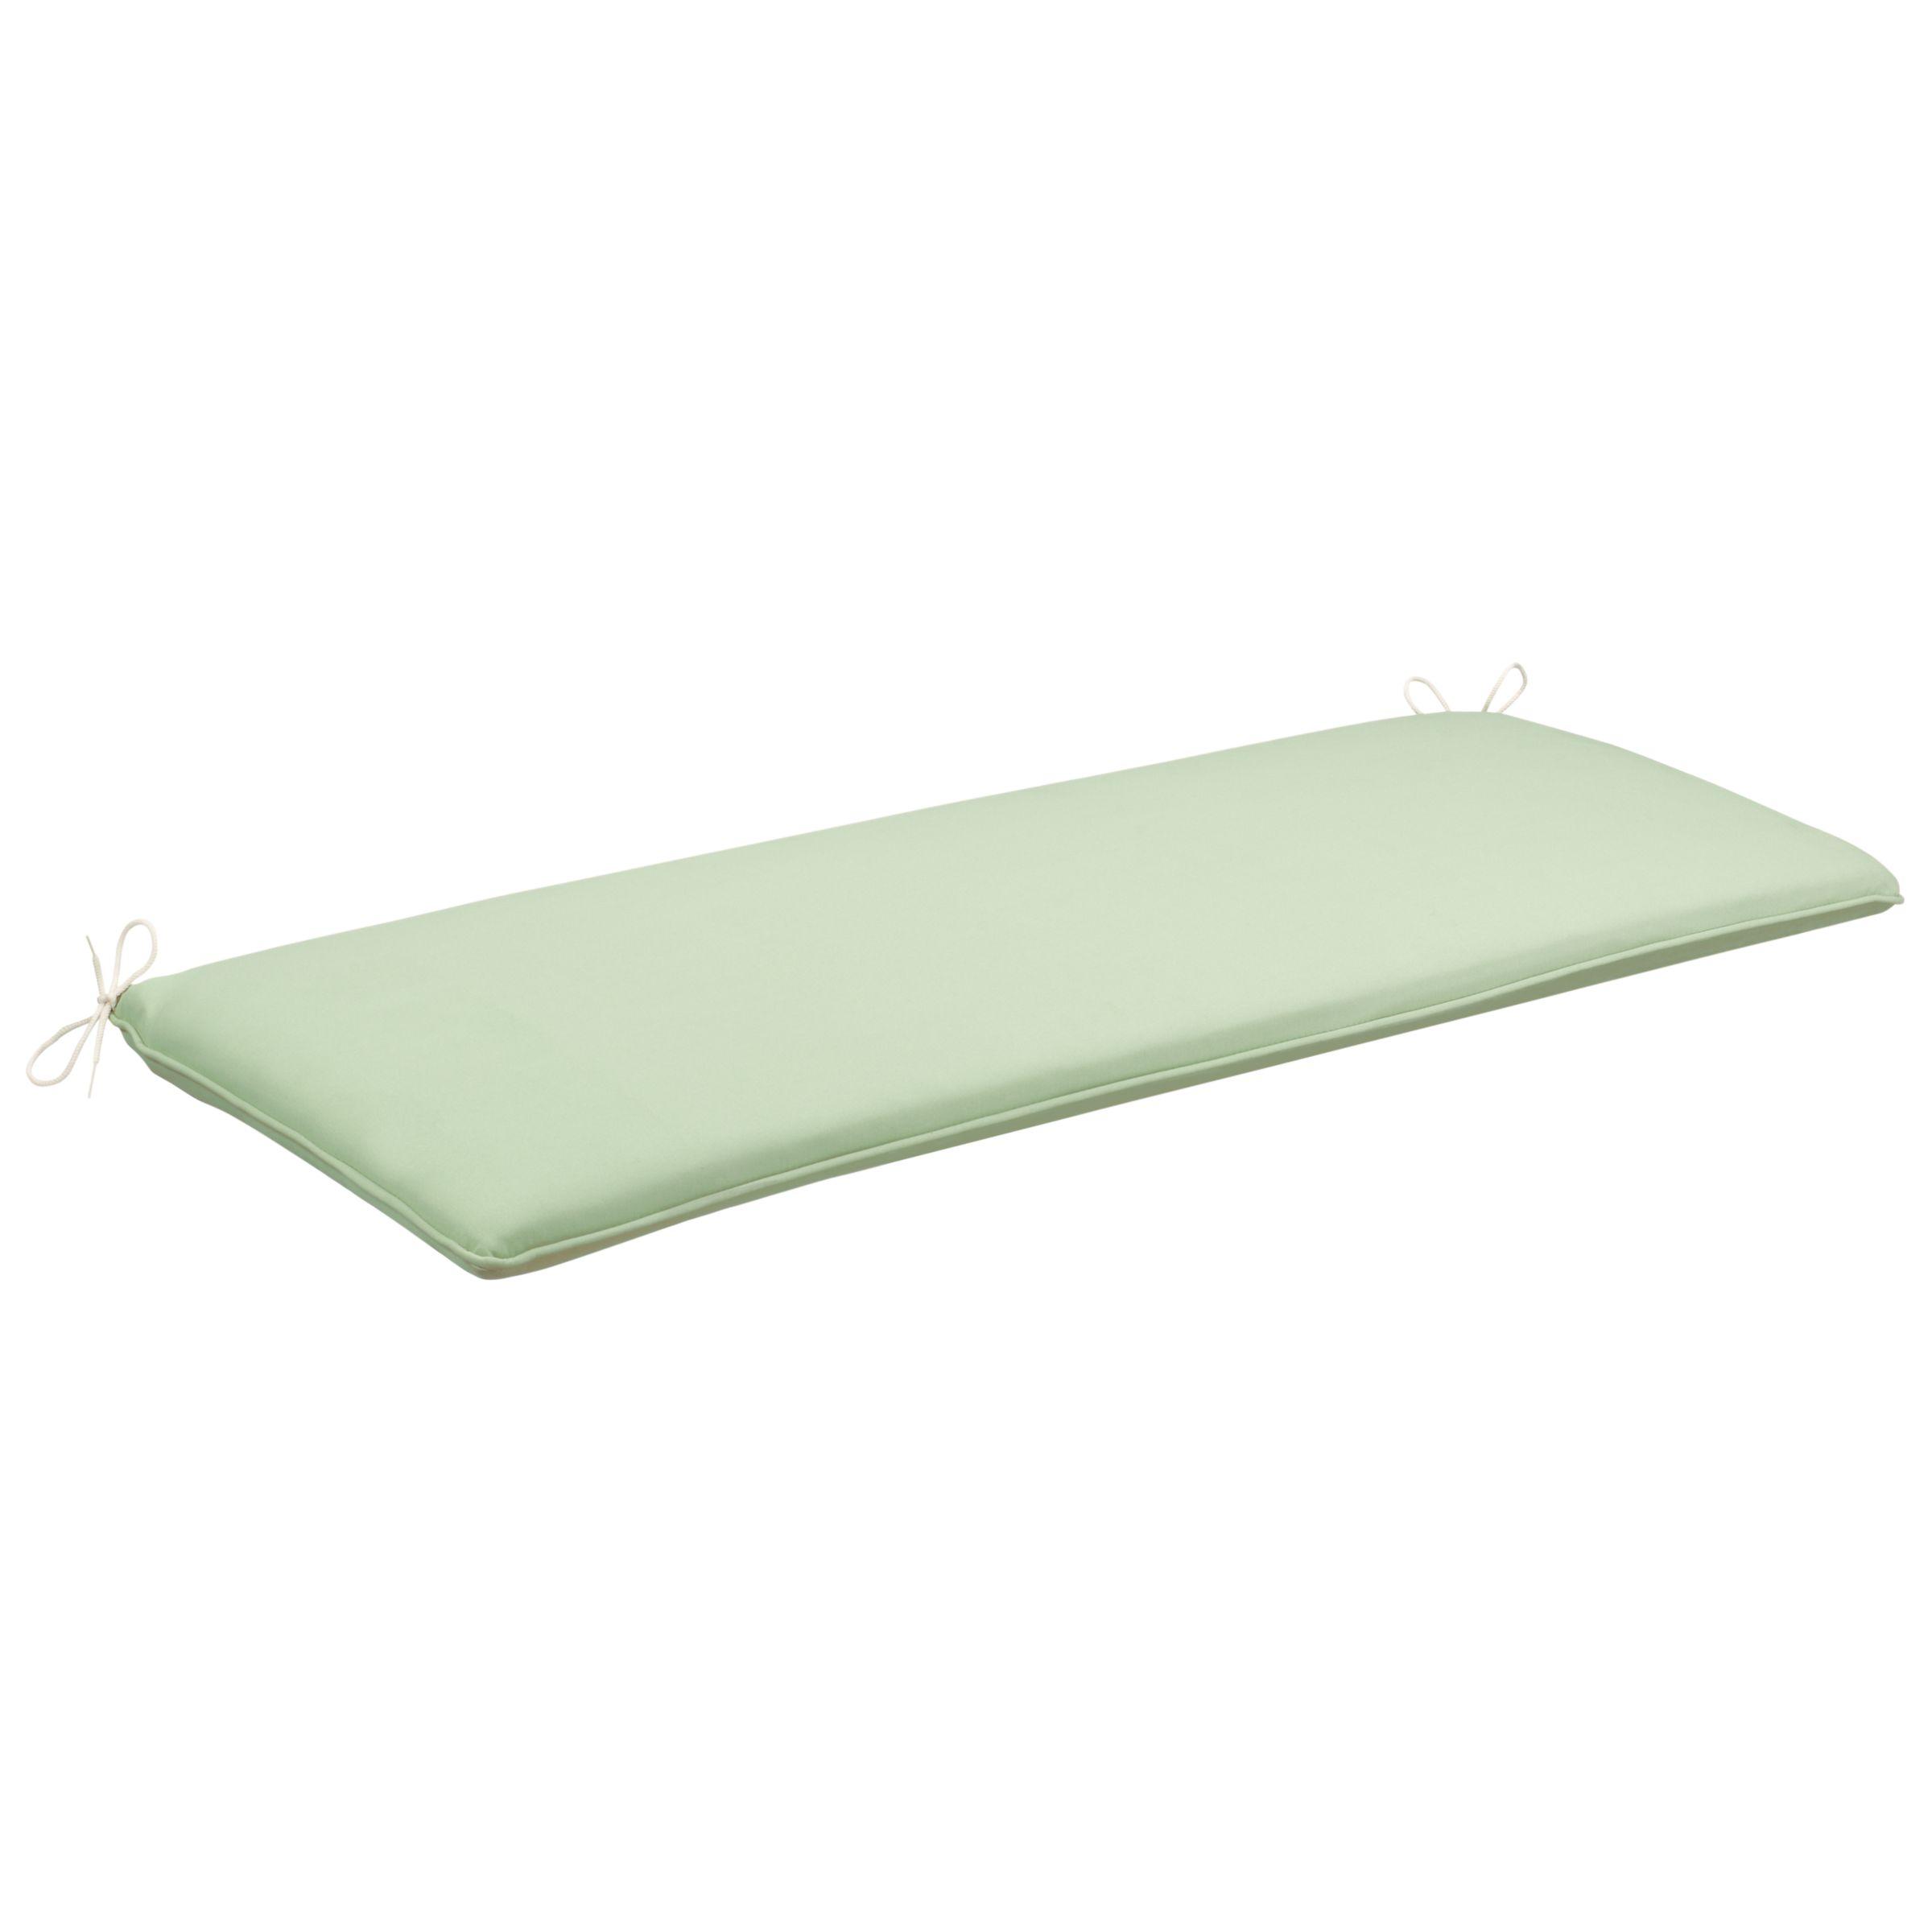 John Lewis Bench Cushion, Leaf